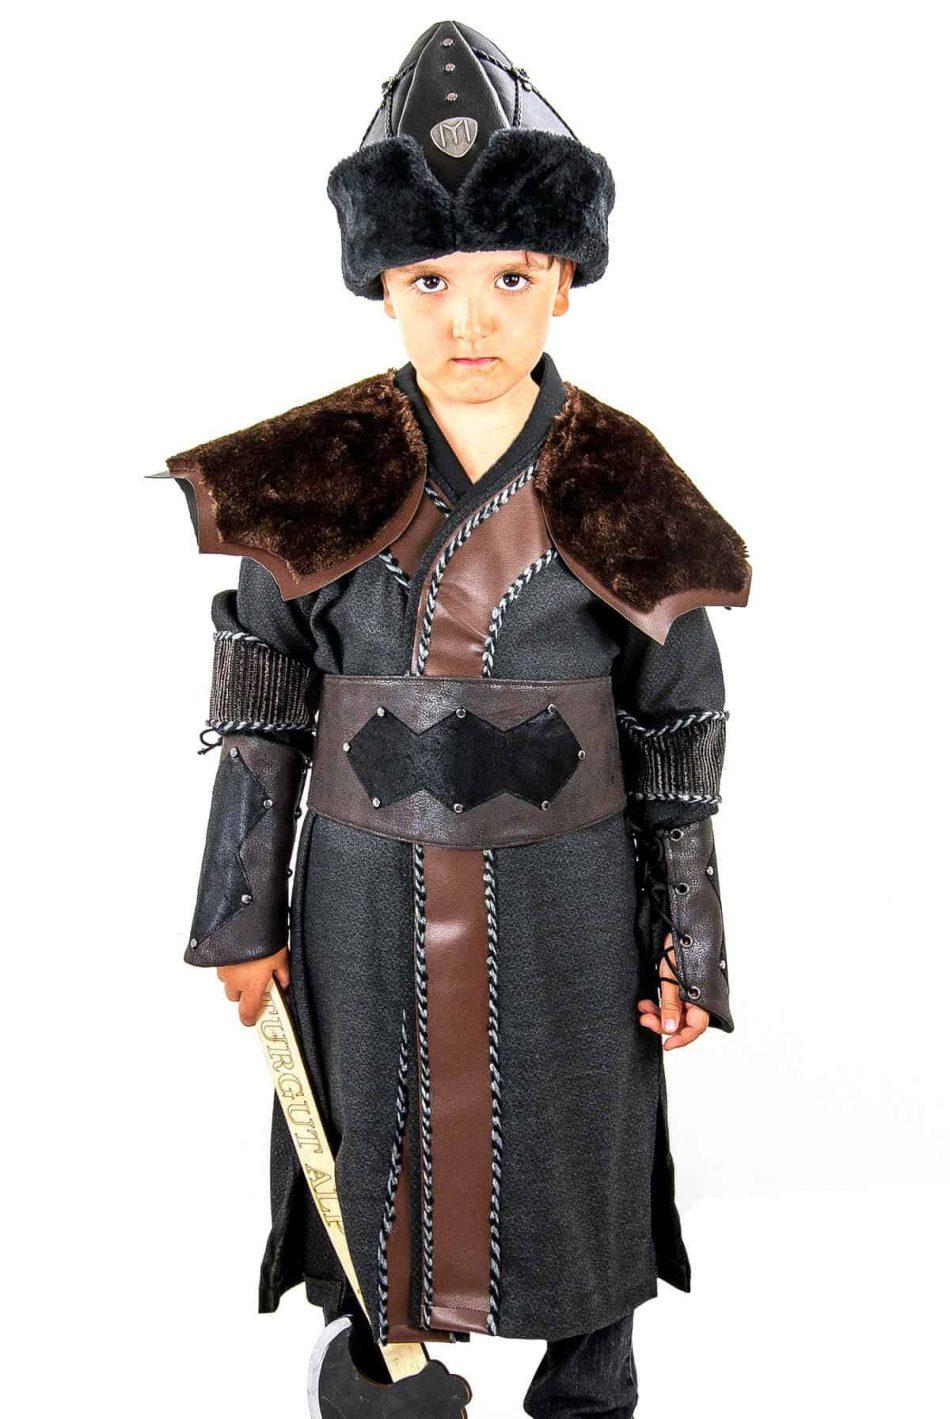 Resurrection Ertugrul Costume Alp Outfit For Children DC 106 05 950x1419 - Resurrection Ertugrul Costume Alp Outfit For Children